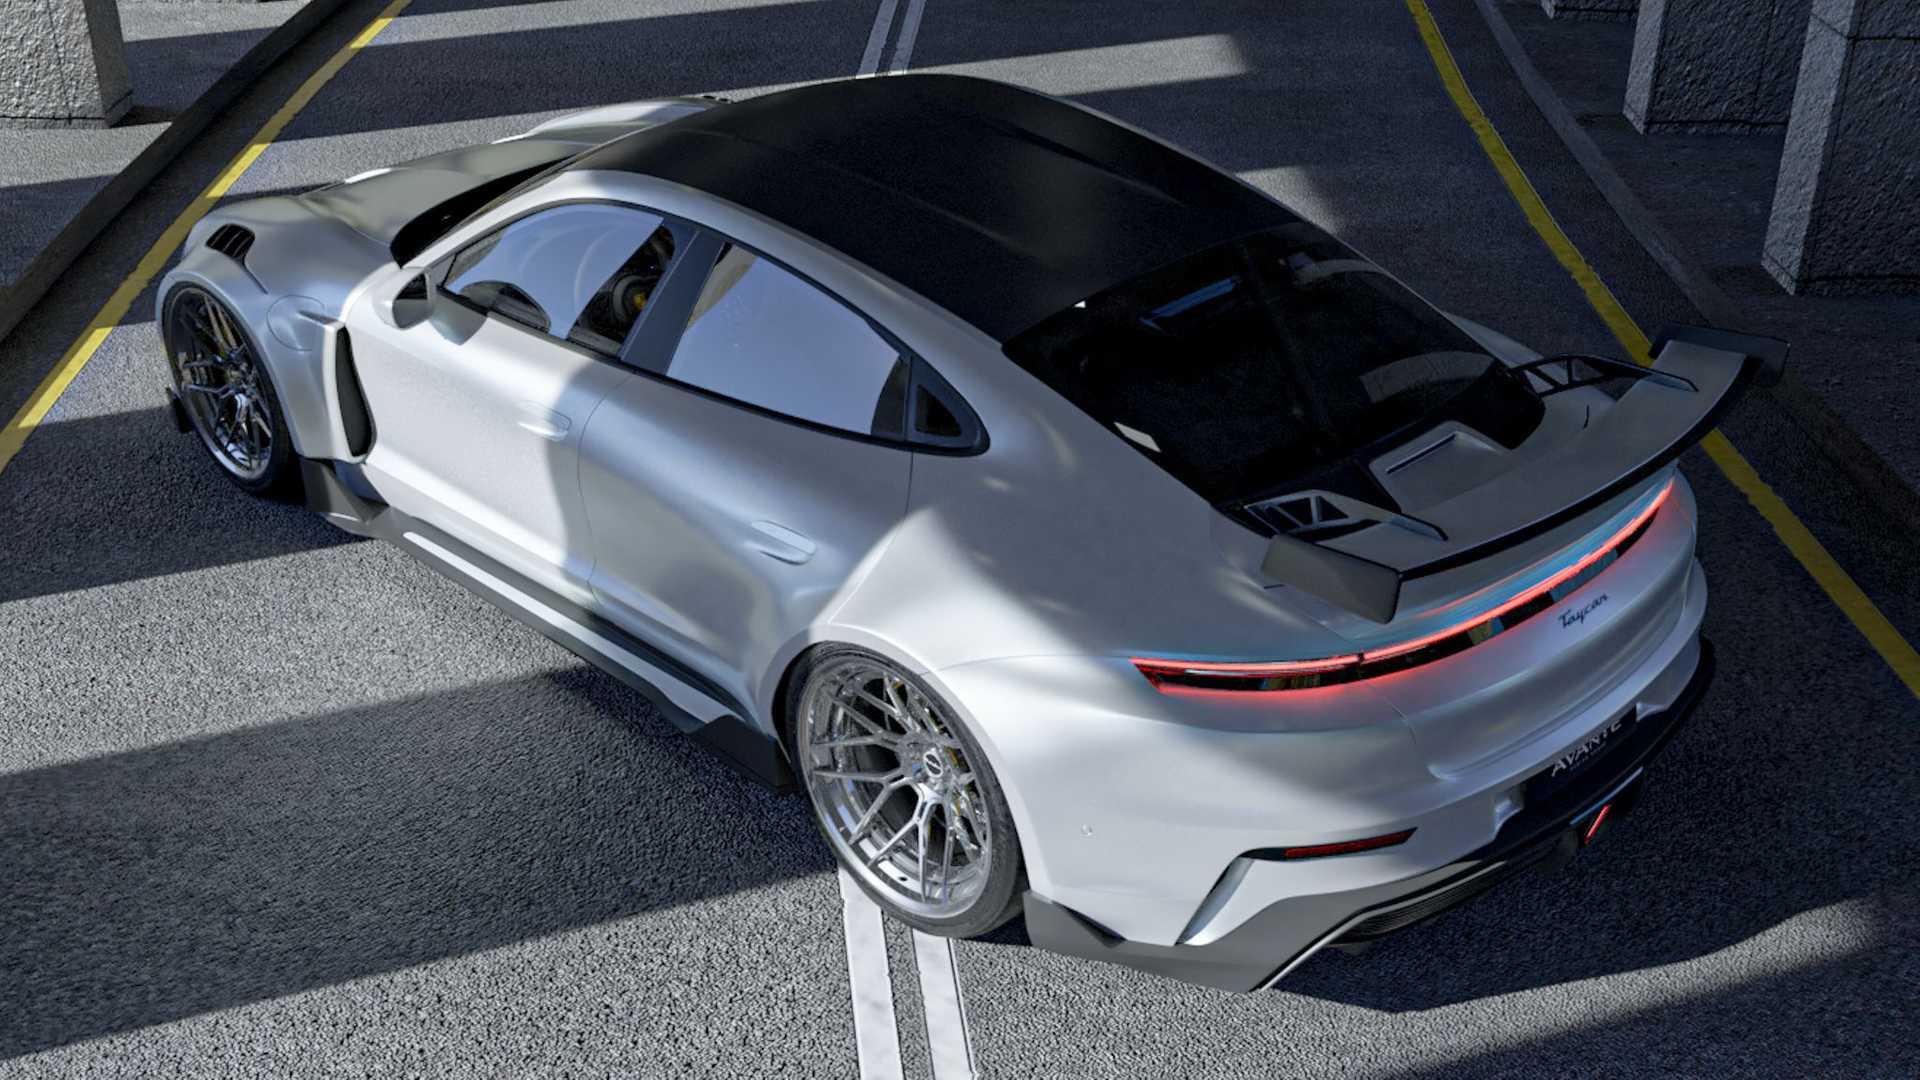 Porsche-Taycan-by-Avante-Design-7